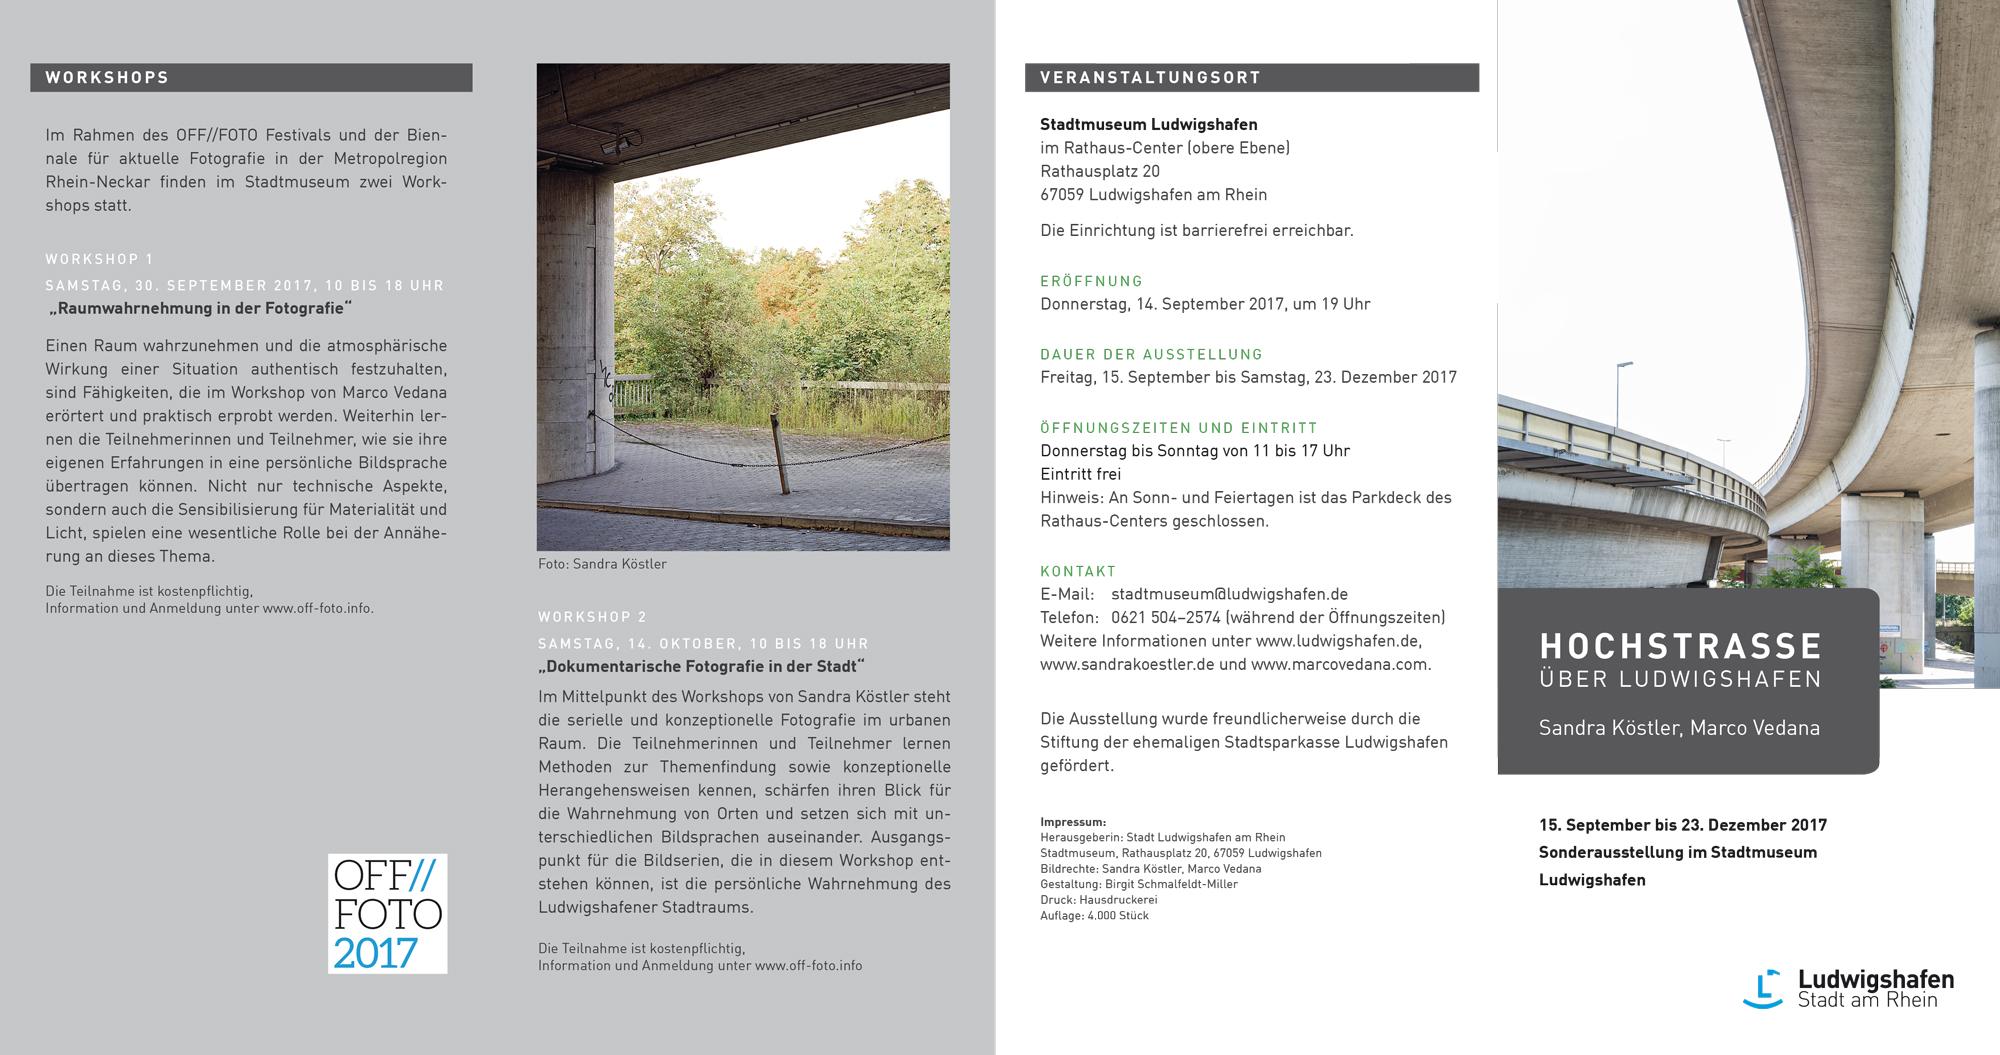 Faltblatt_Hochstrasse_web-1.jpg